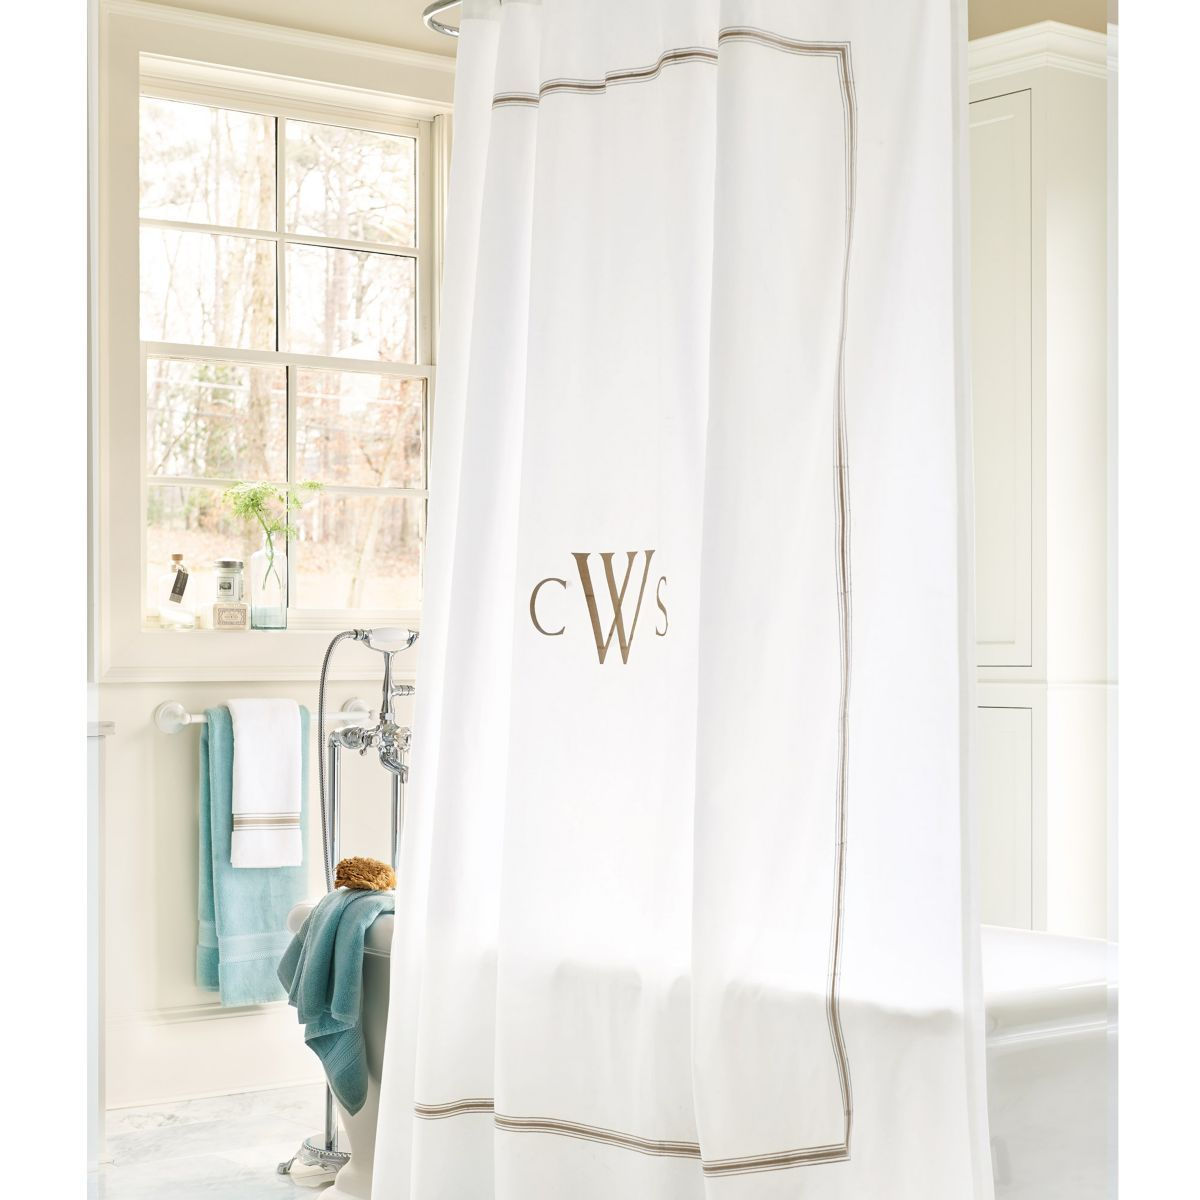 Ballard Designs Shower Curtain.Amelie Embroidered Shower Curtain Jessi S House Cool